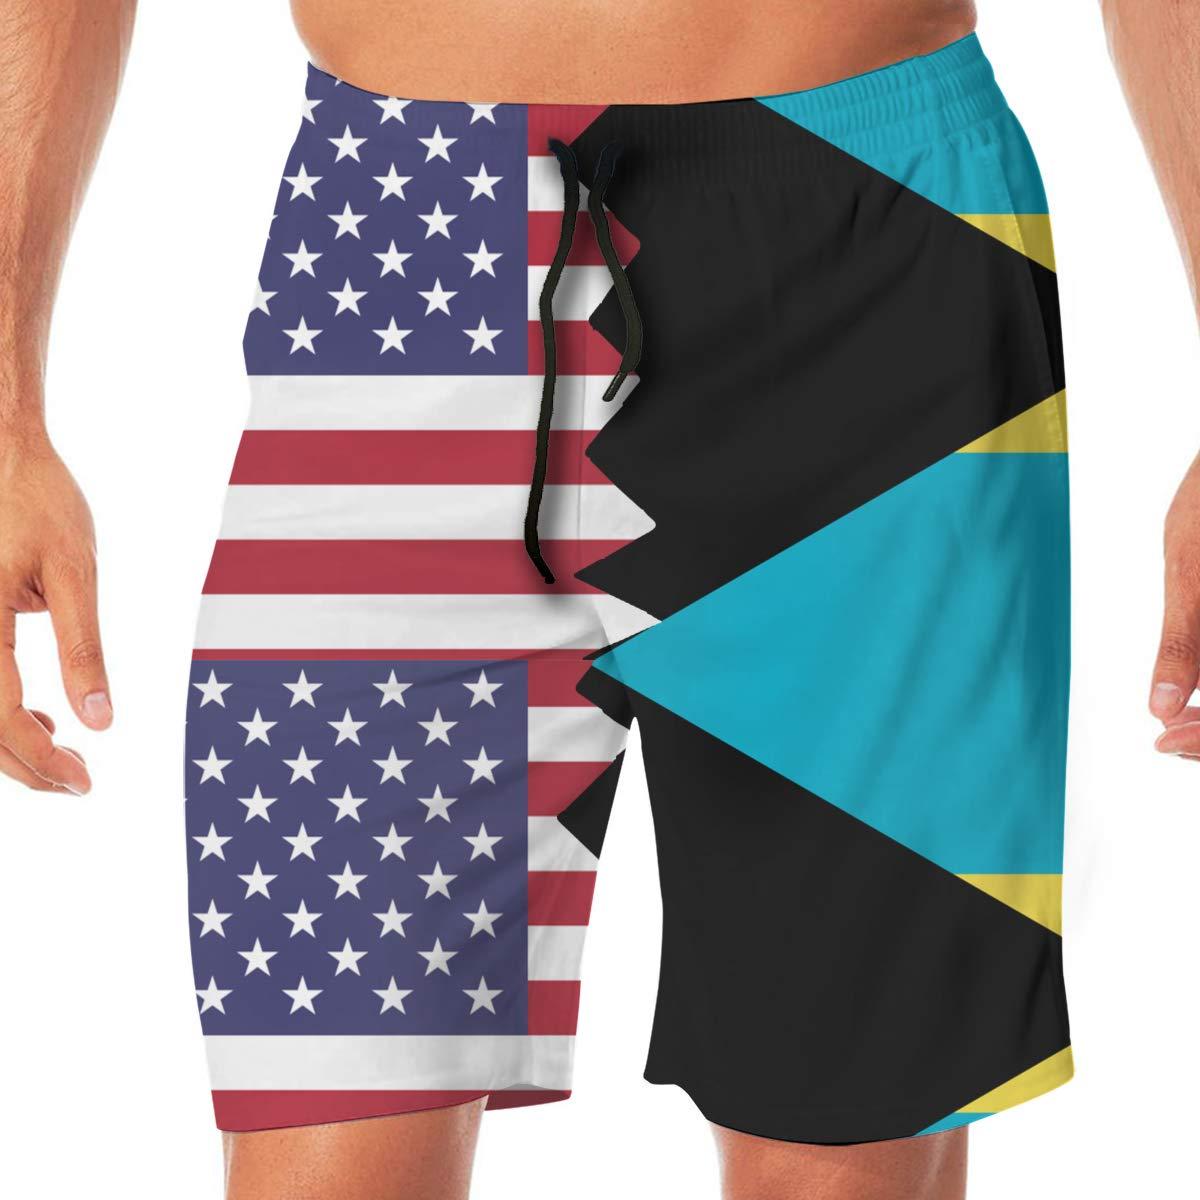 YGE.I.L25 Mens Swim Shorts American Bahamas Flag Summer Vacation Beach Board Short with Pocket